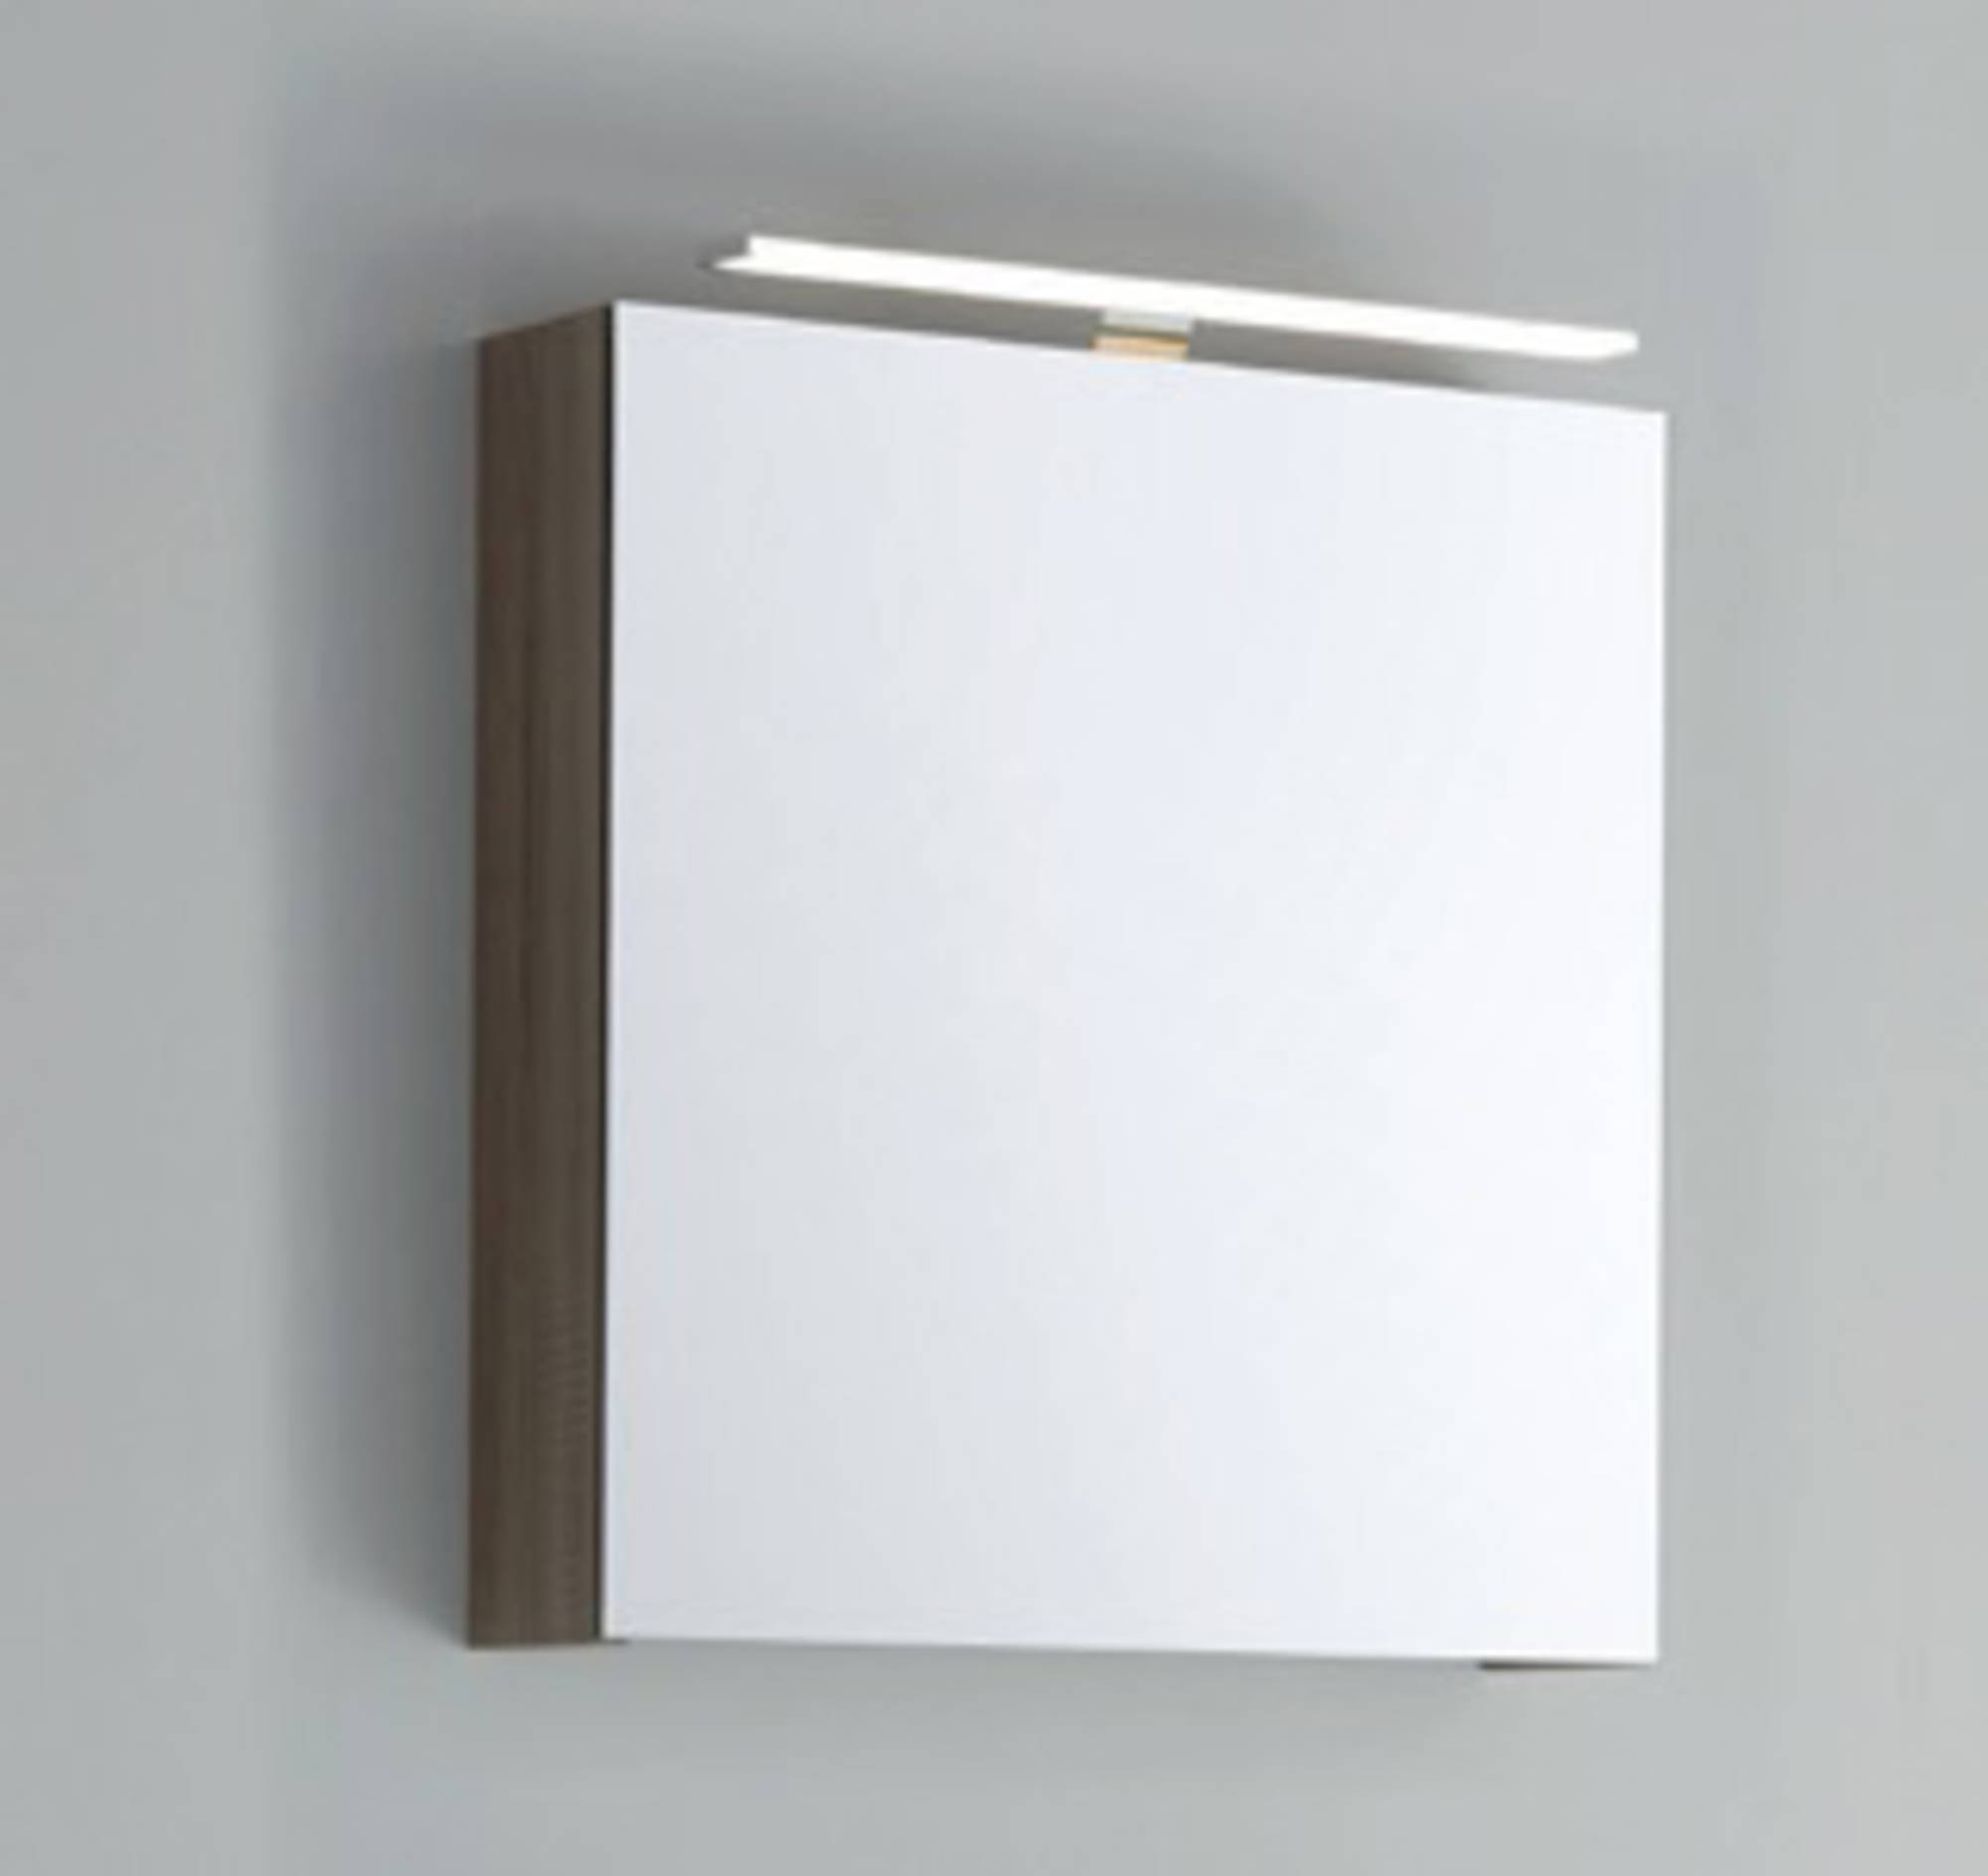 Line 45 Spiegelkast Rechtsdraaiend 60x13,5x60 cm excl. Verlichting Nebraska Eiken